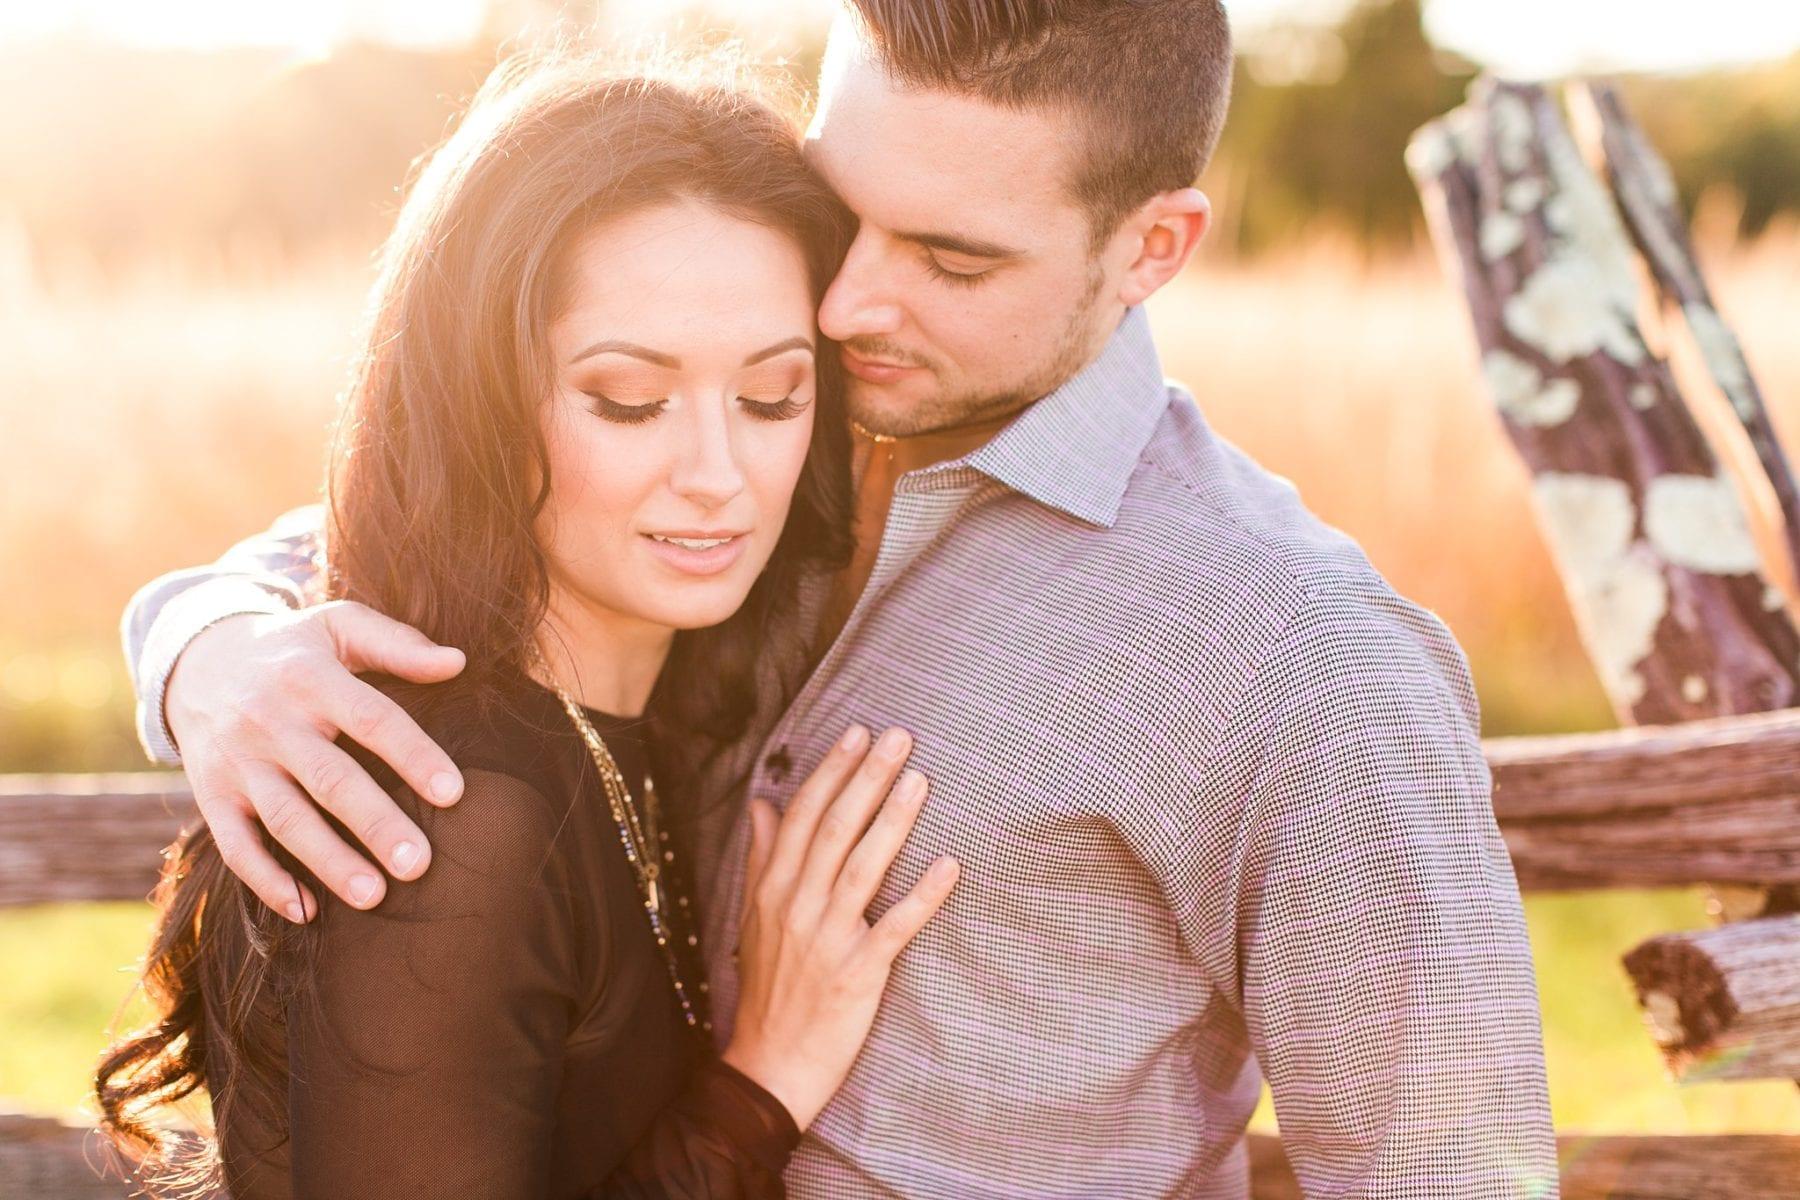 Manassas Battlefield Portraits Virginia Wedding Photographer Megan Kelsey Photography Lianne & Chris-118.jpg